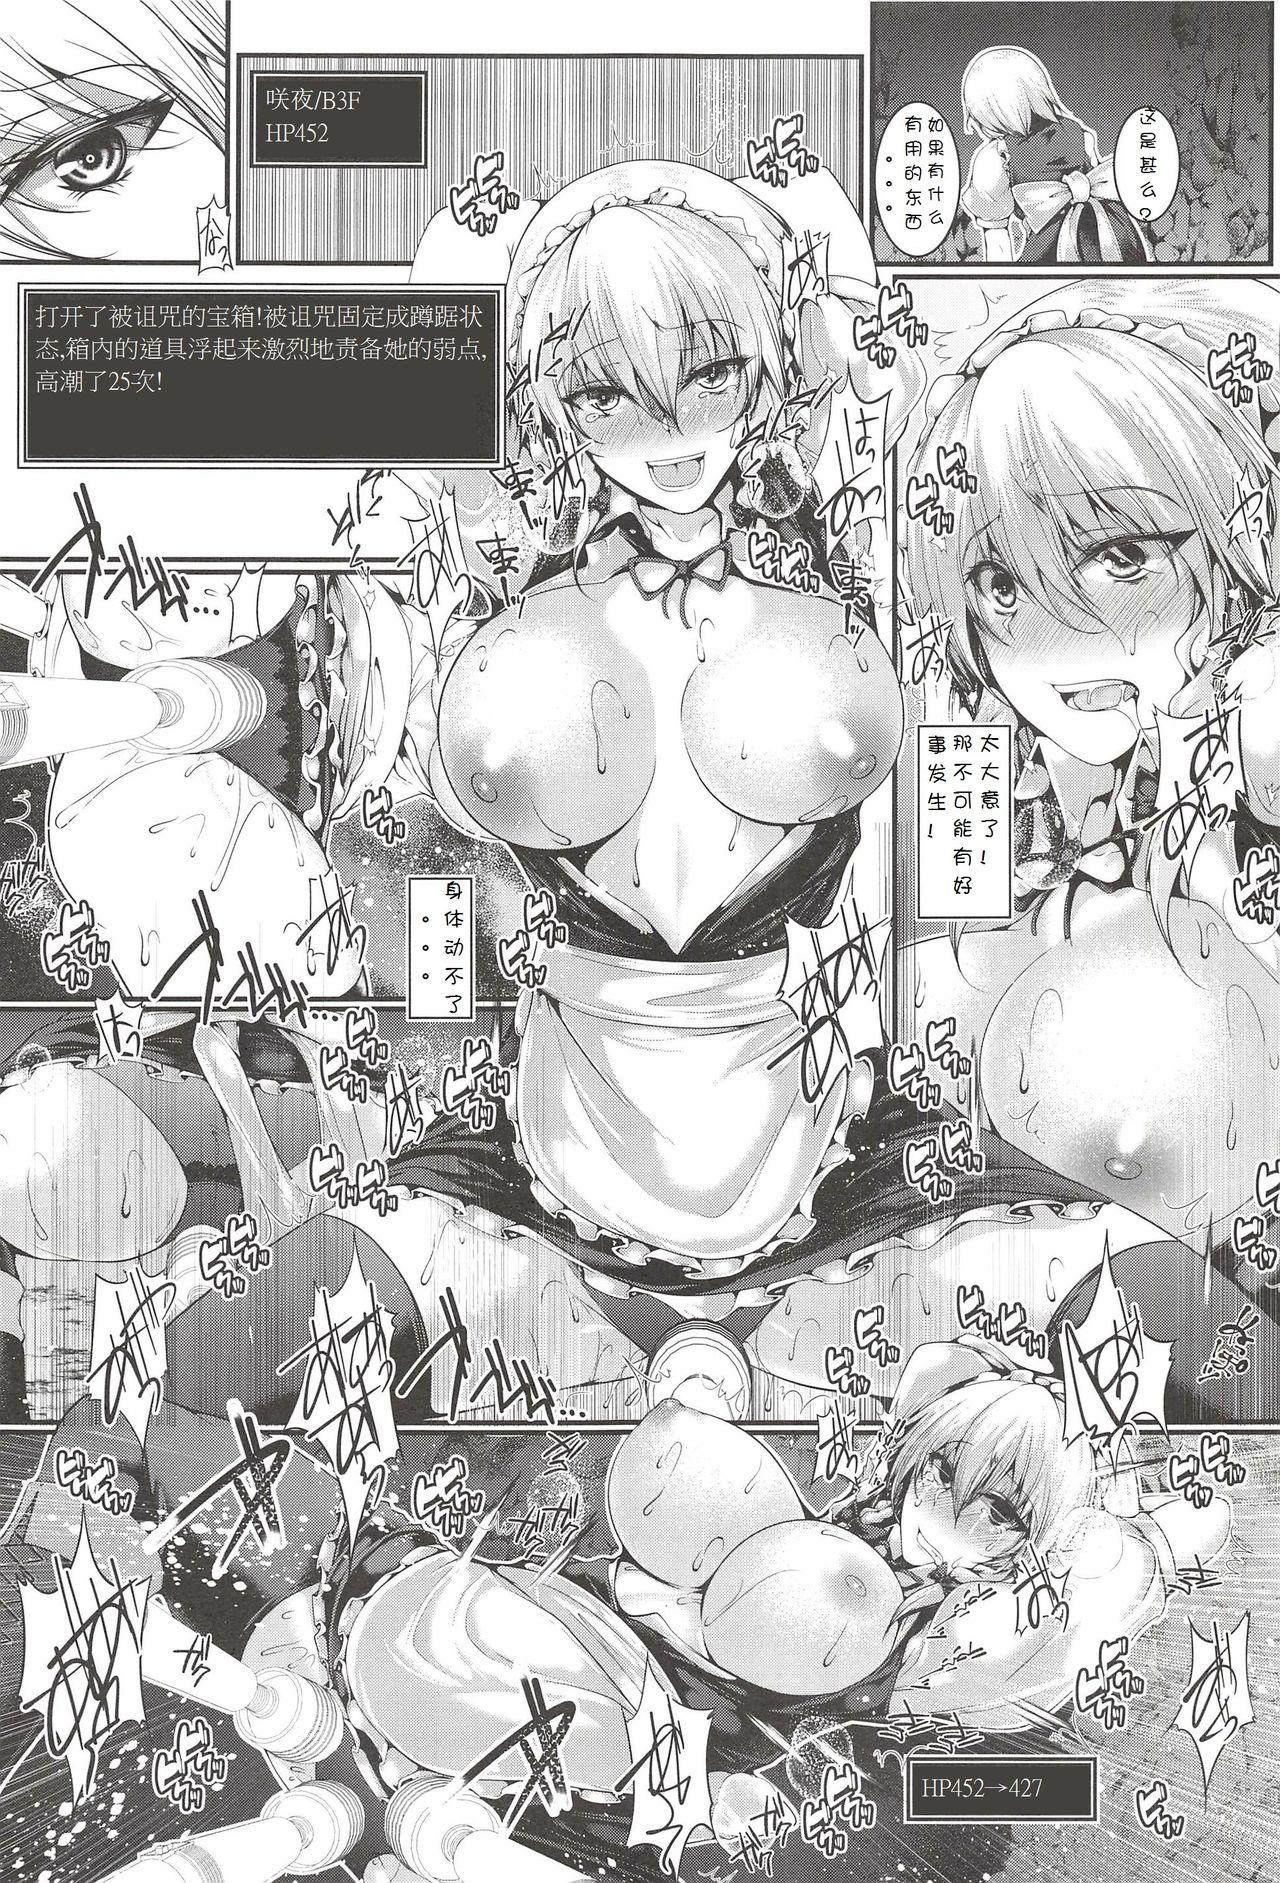 Sakuya-san Tachi no Ero Trap Dungeon 6